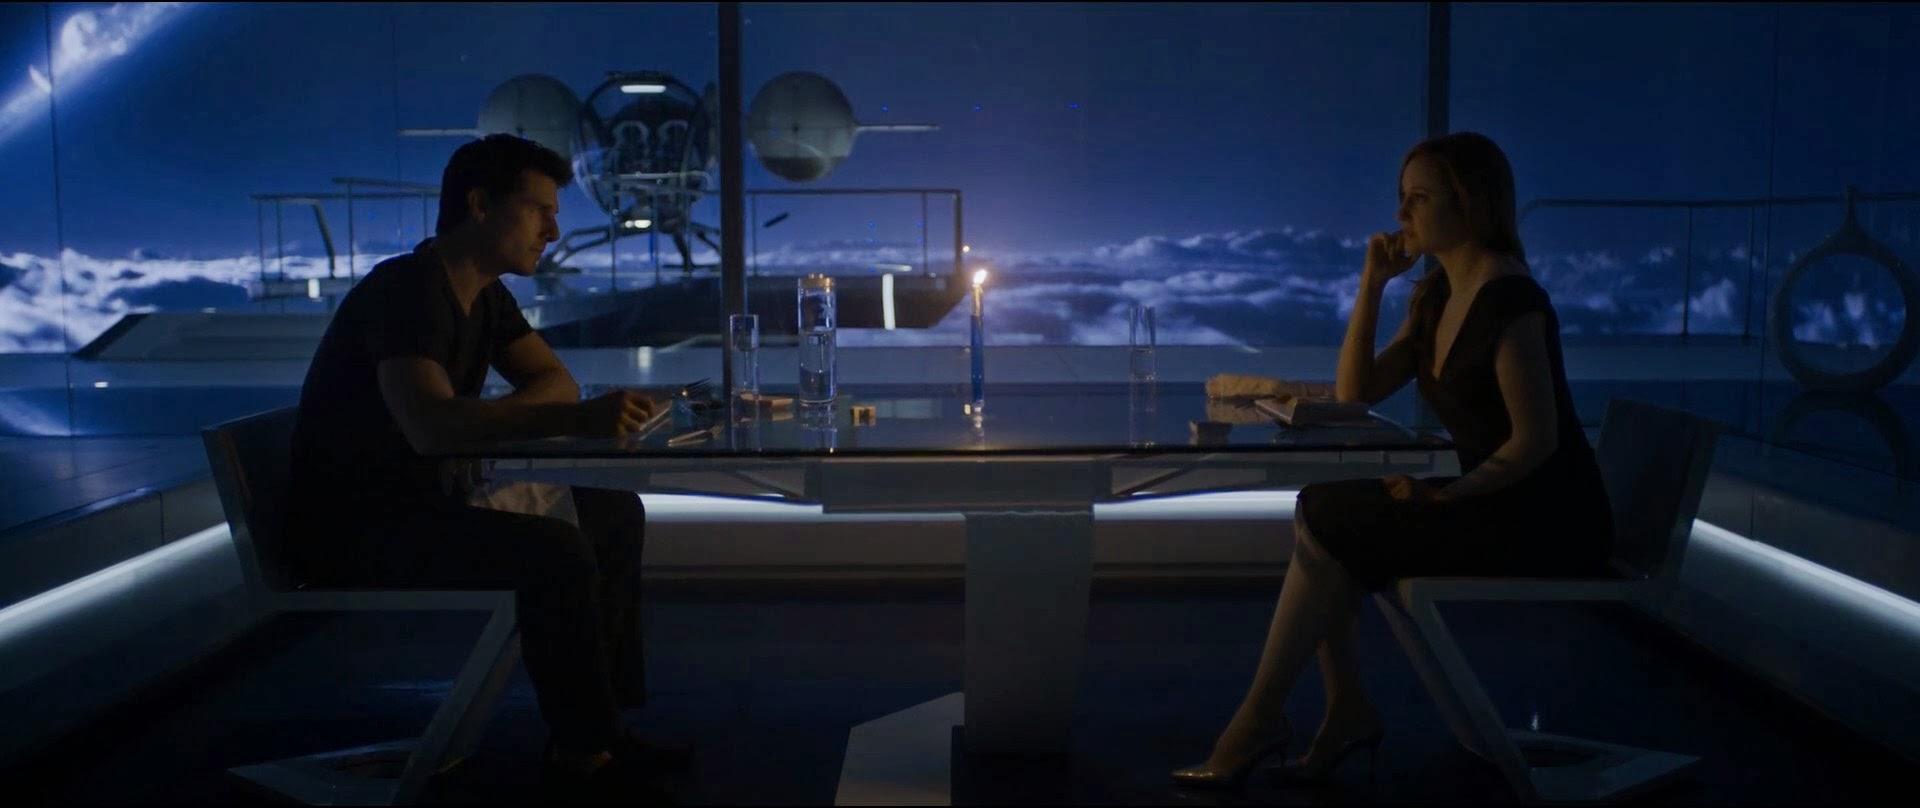 Oblivion (2013) BluRay 1080p 5.1CH x264 Ganool_0006